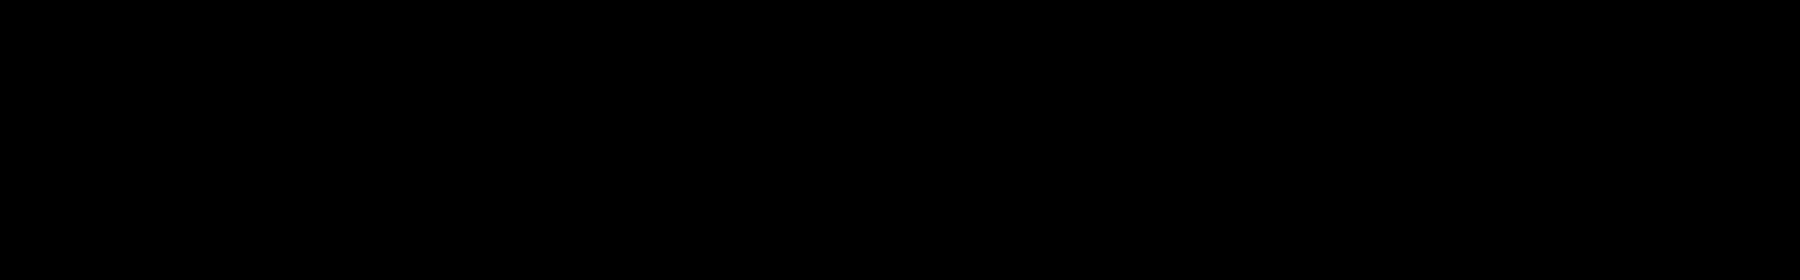 Acapella Vocals audio waveform